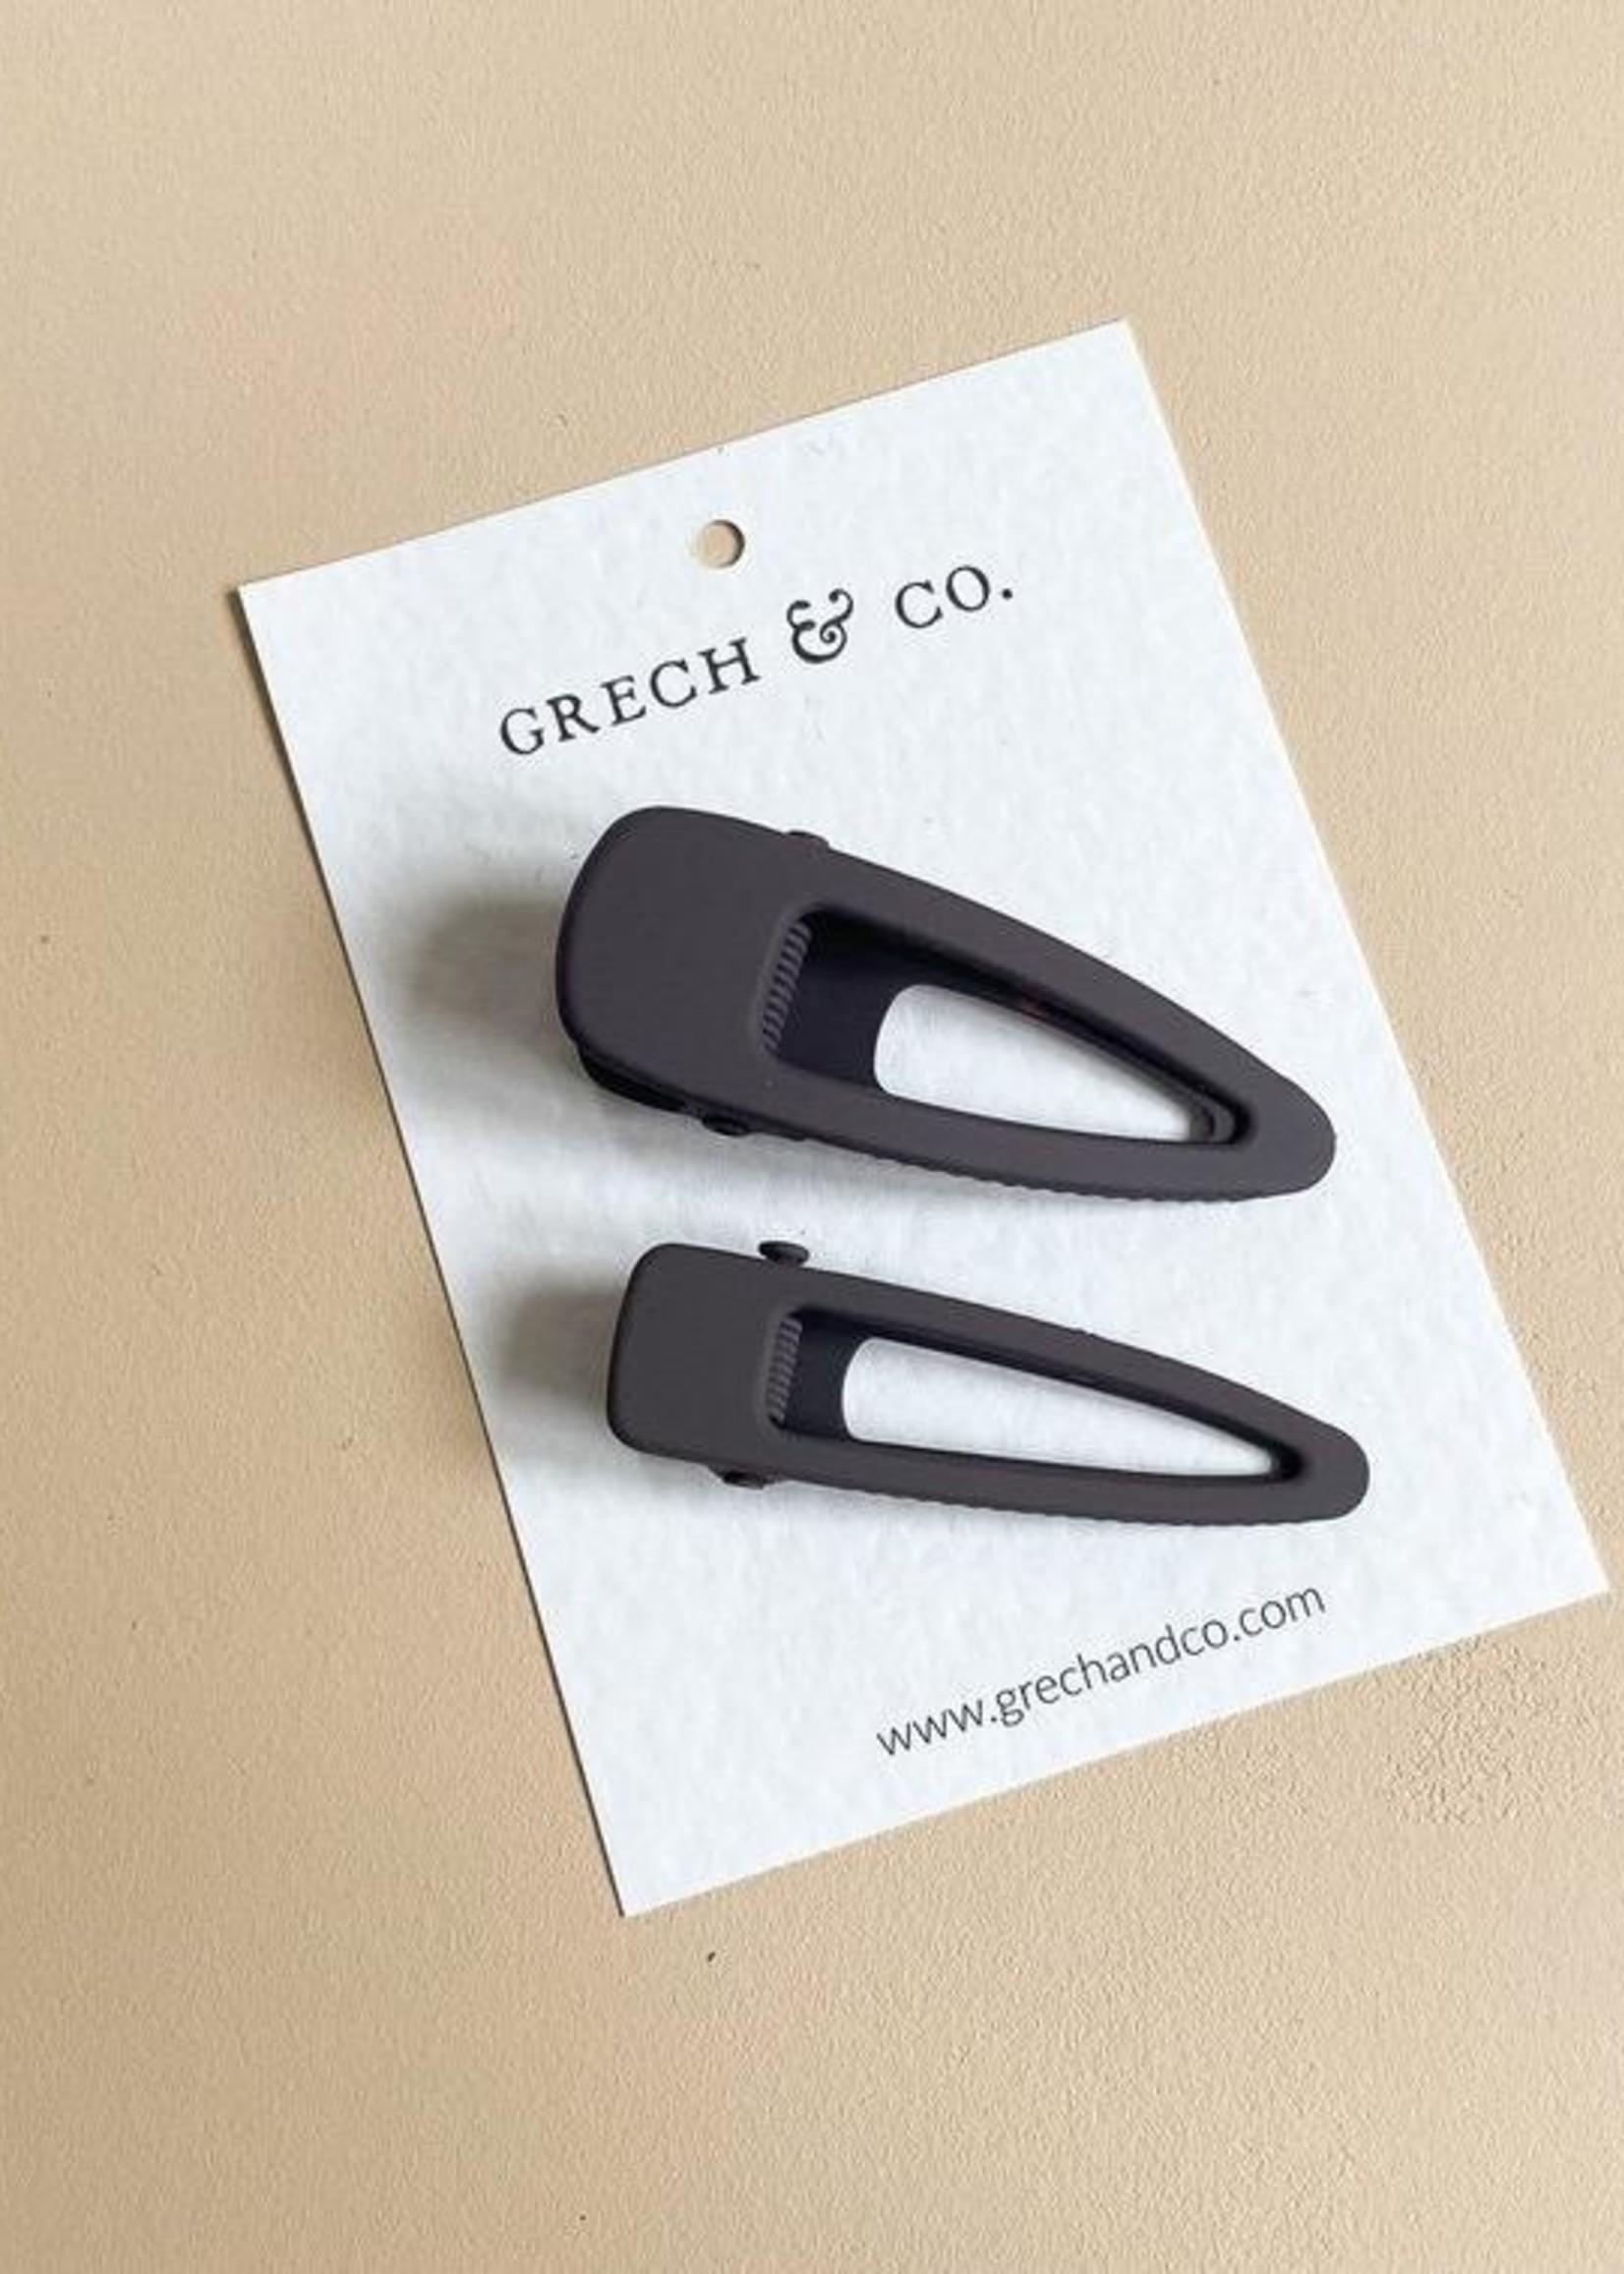 Grech & Co Grech & Co - Matte clip Set - Charcoal